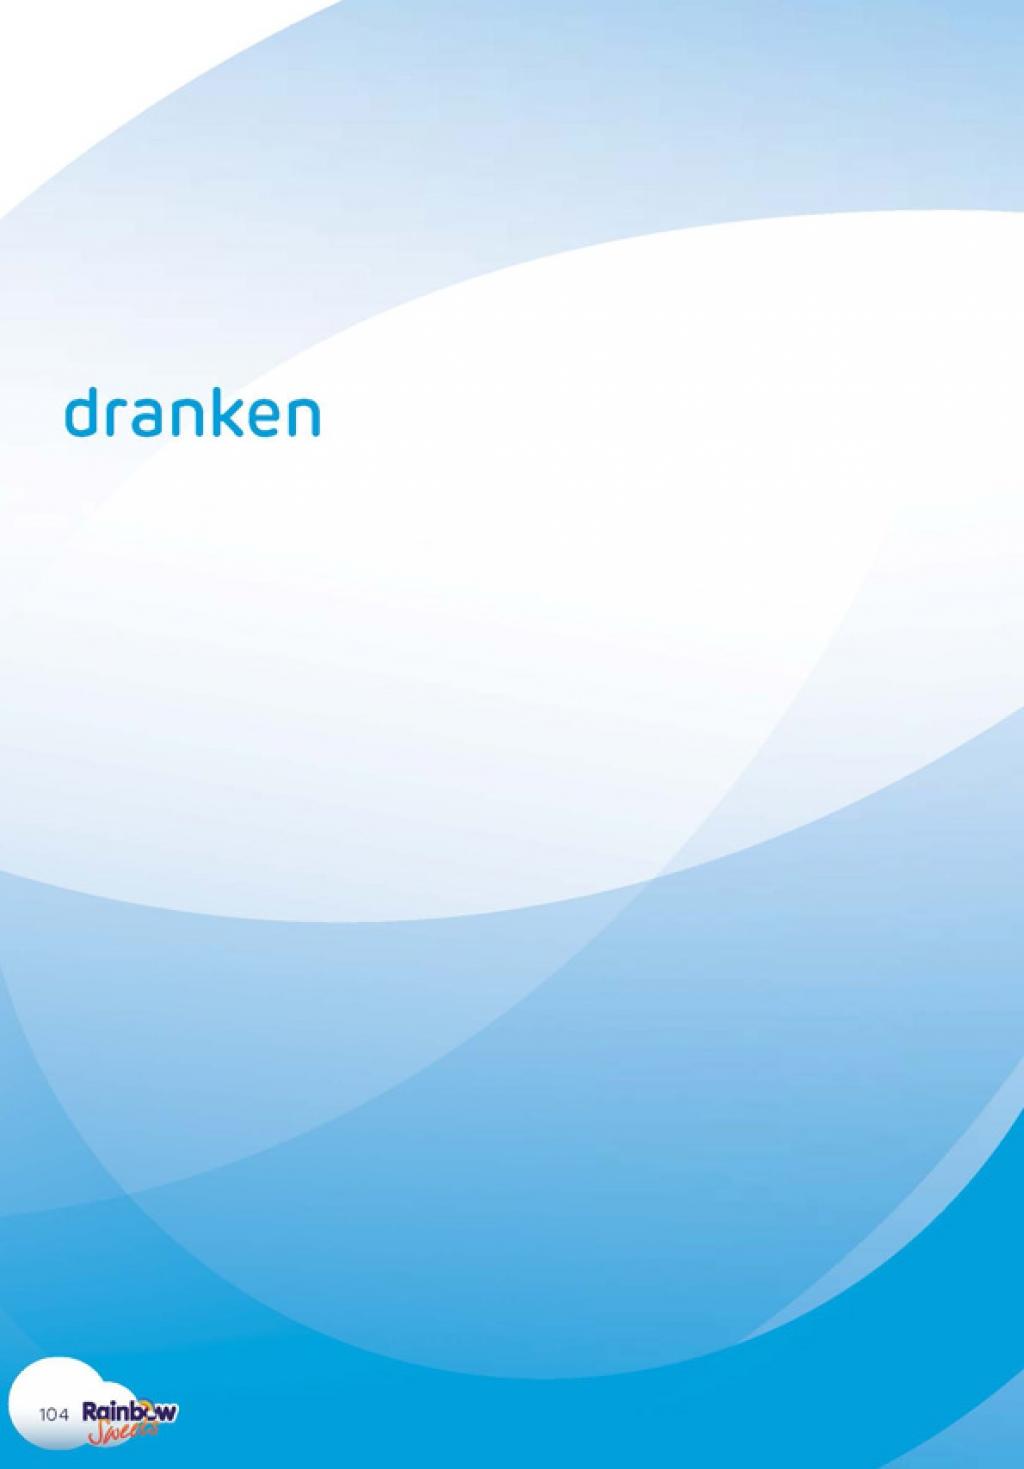 web-LR_RBS1208G_Dranken_V3_Page_01.jpg